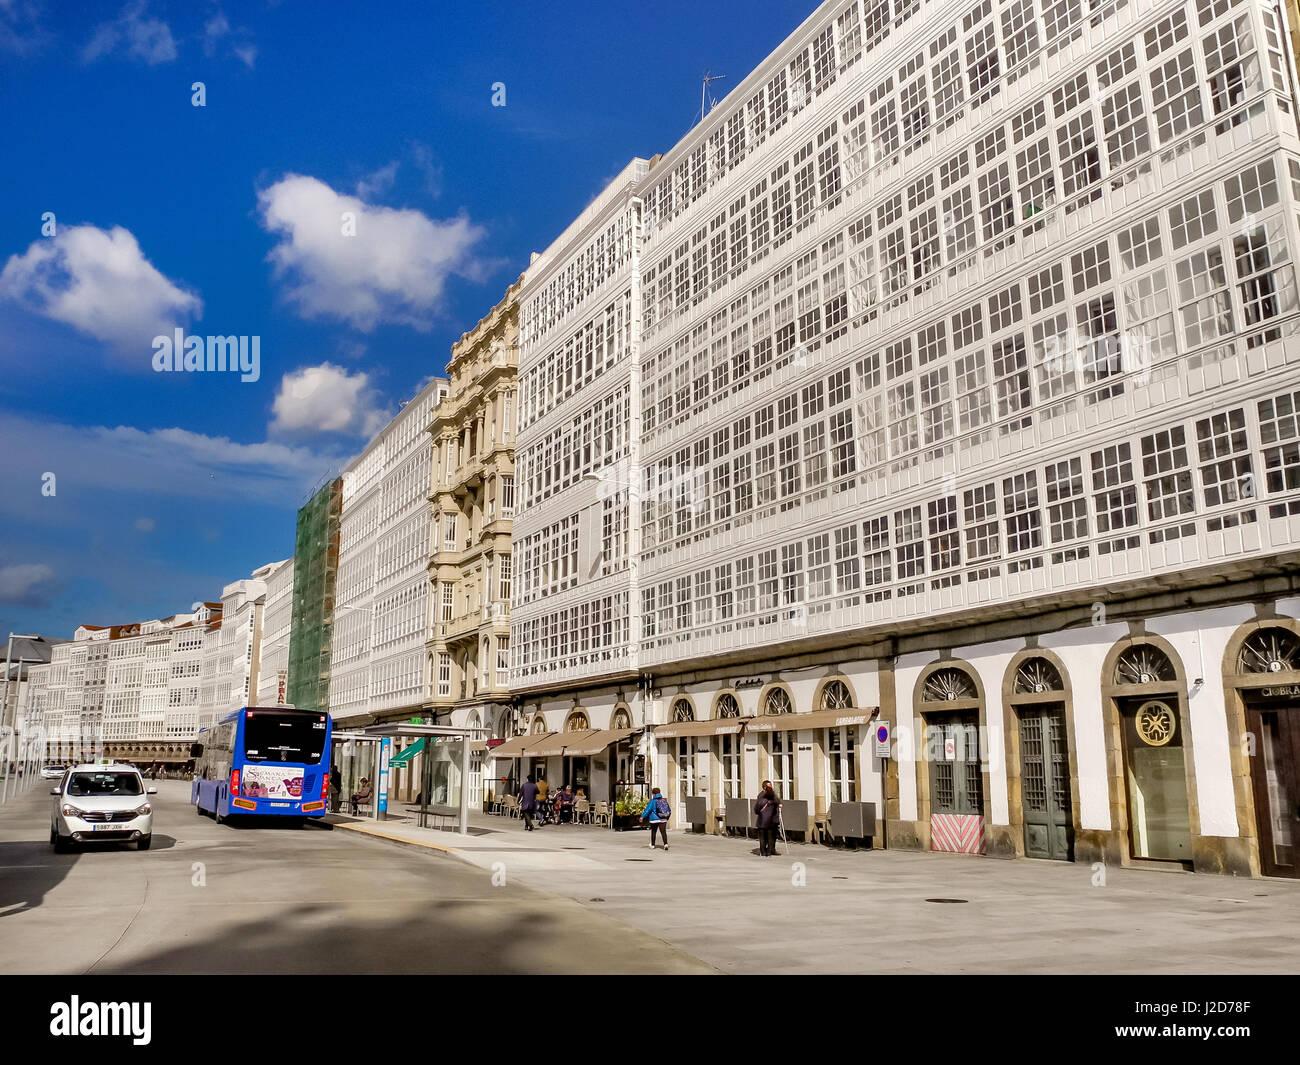 Spain cafe window stockfotos spain cafe window bilder - Beruhmte architektur ...